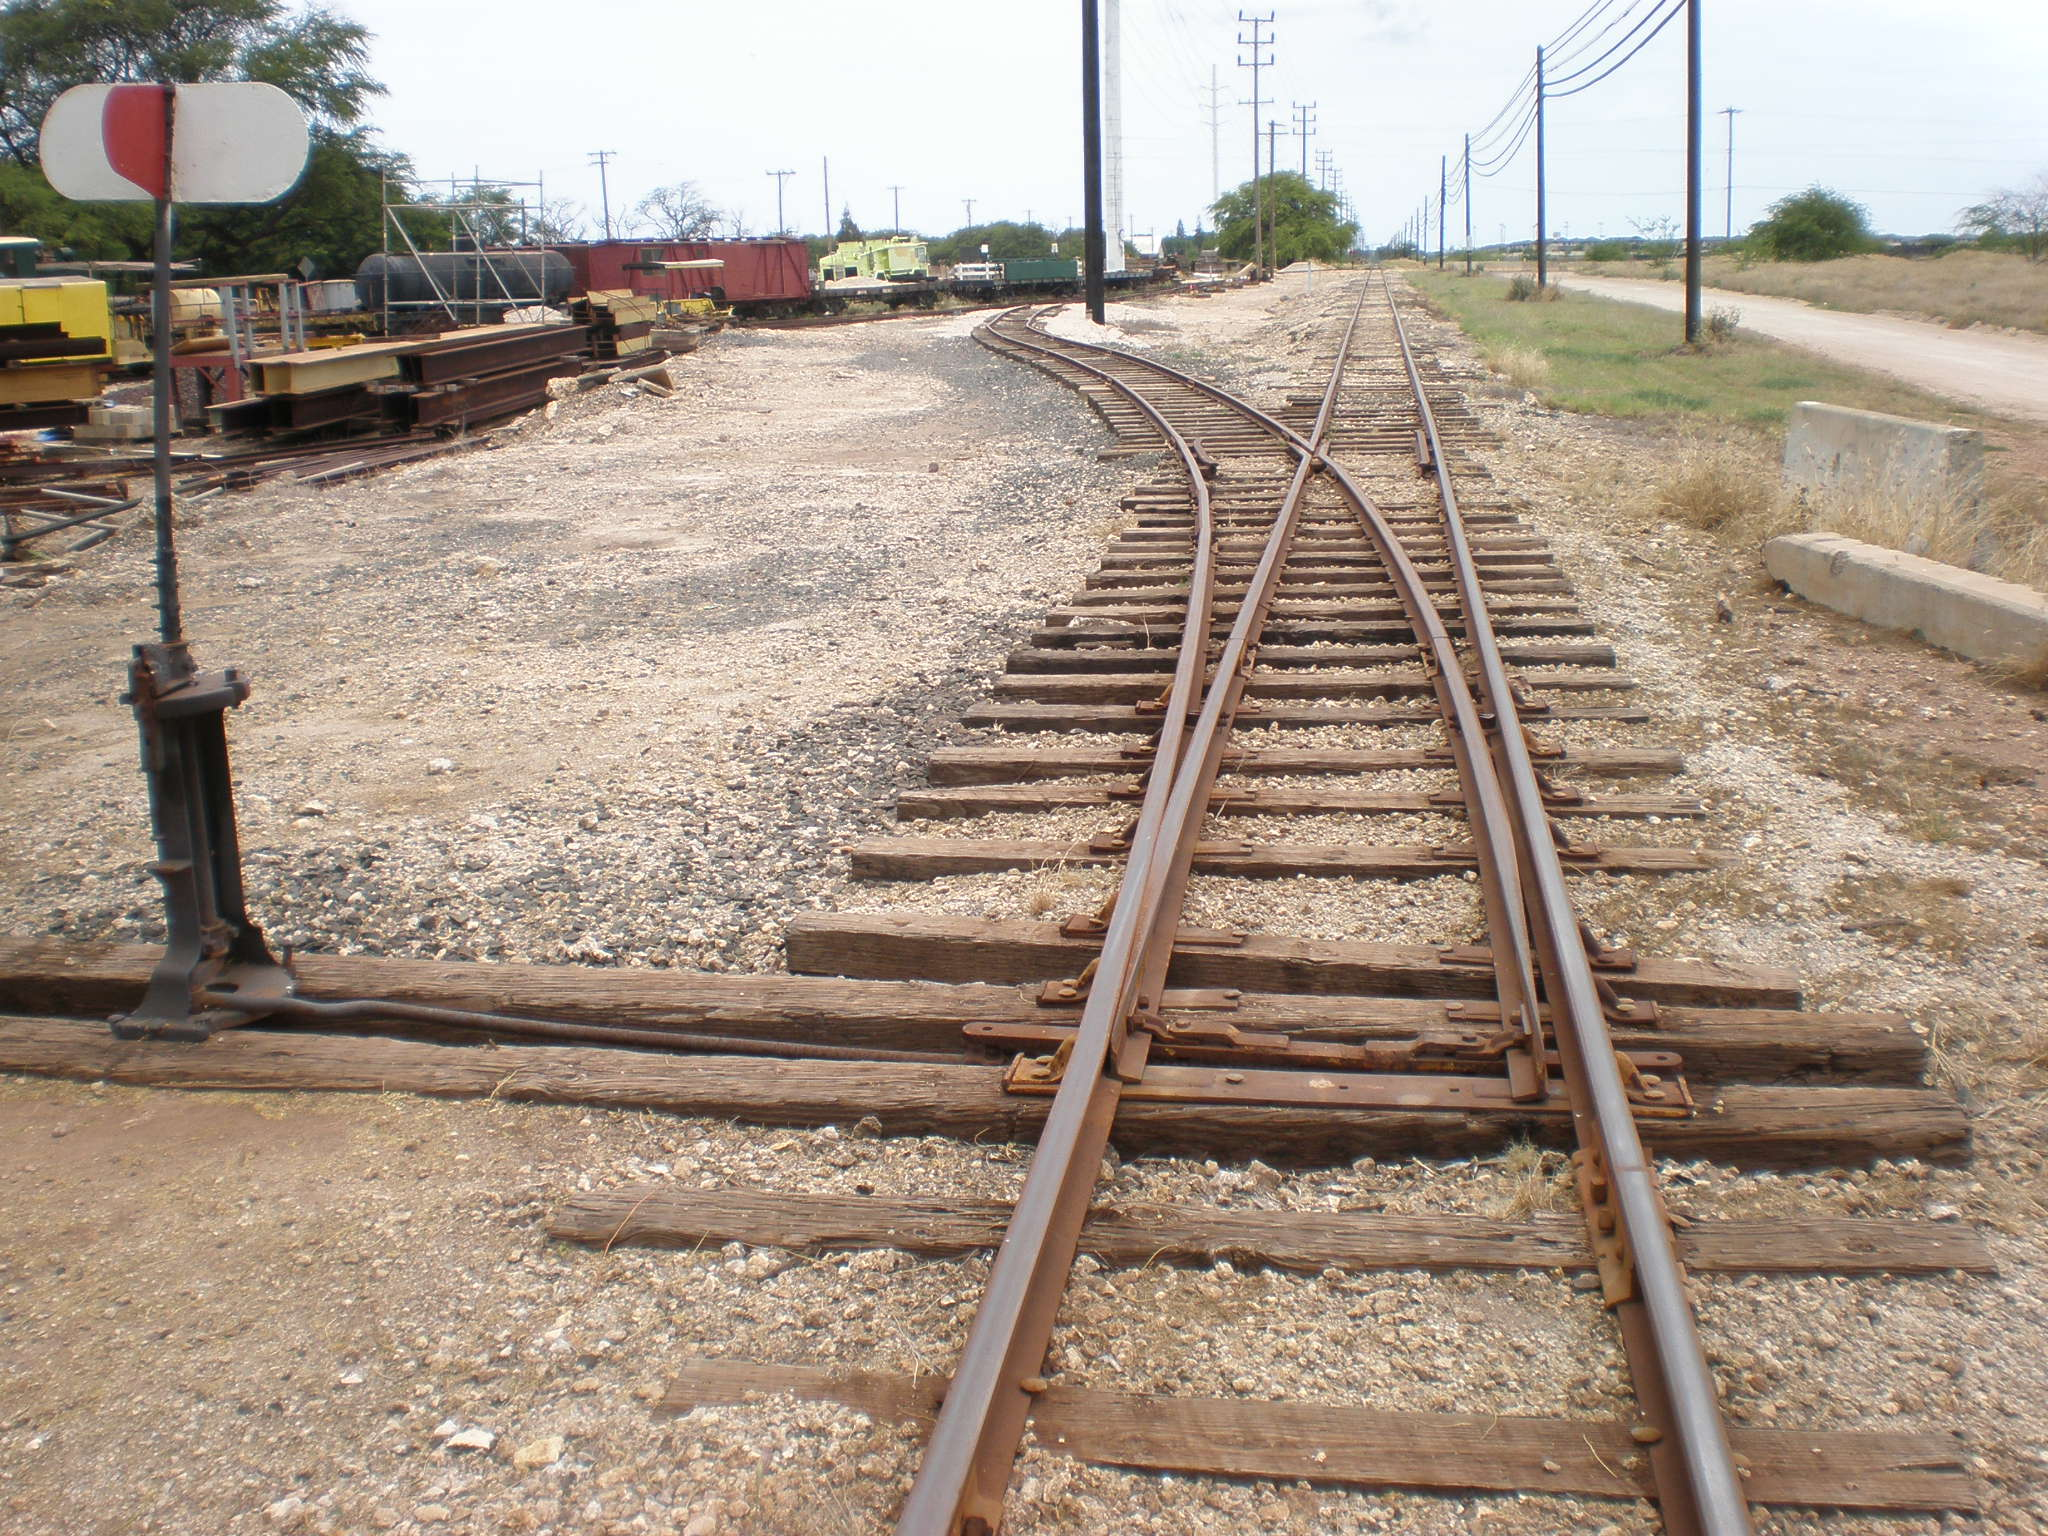 OahuRailway&LandCo-switchtrack-signal.JP